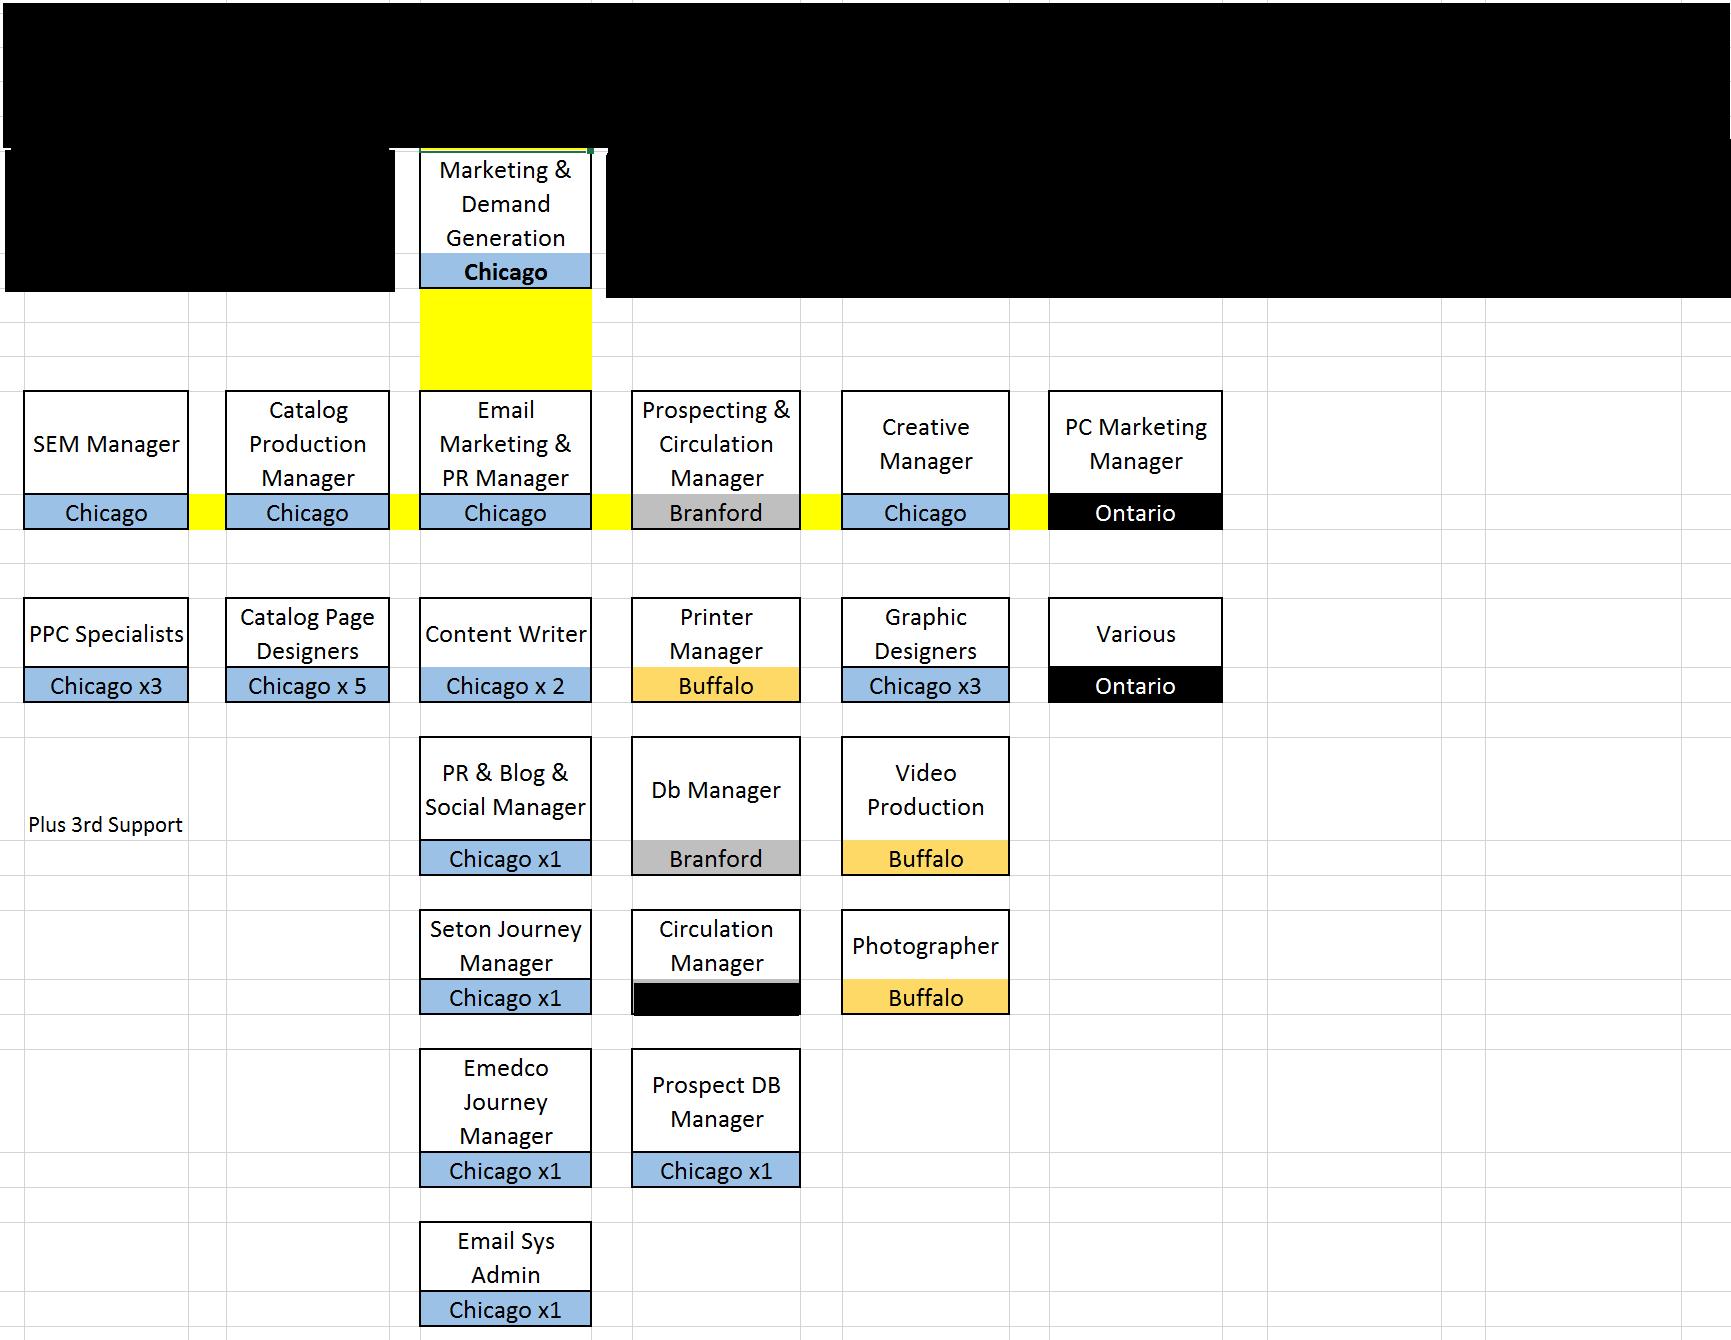 B2B Marketing Organizational Structure